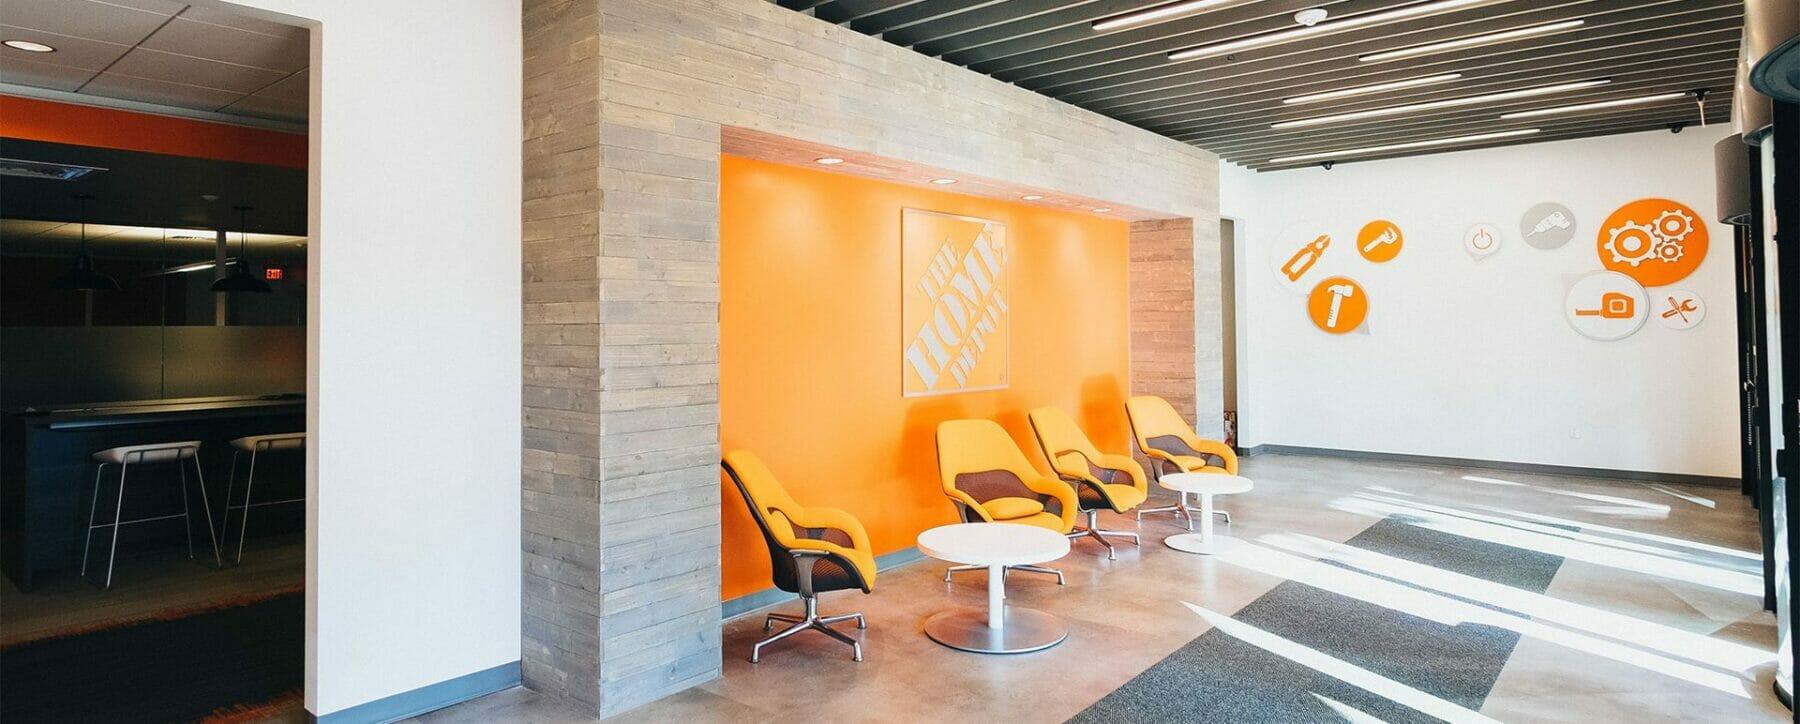 Home Depot Marietta Arco Design Build